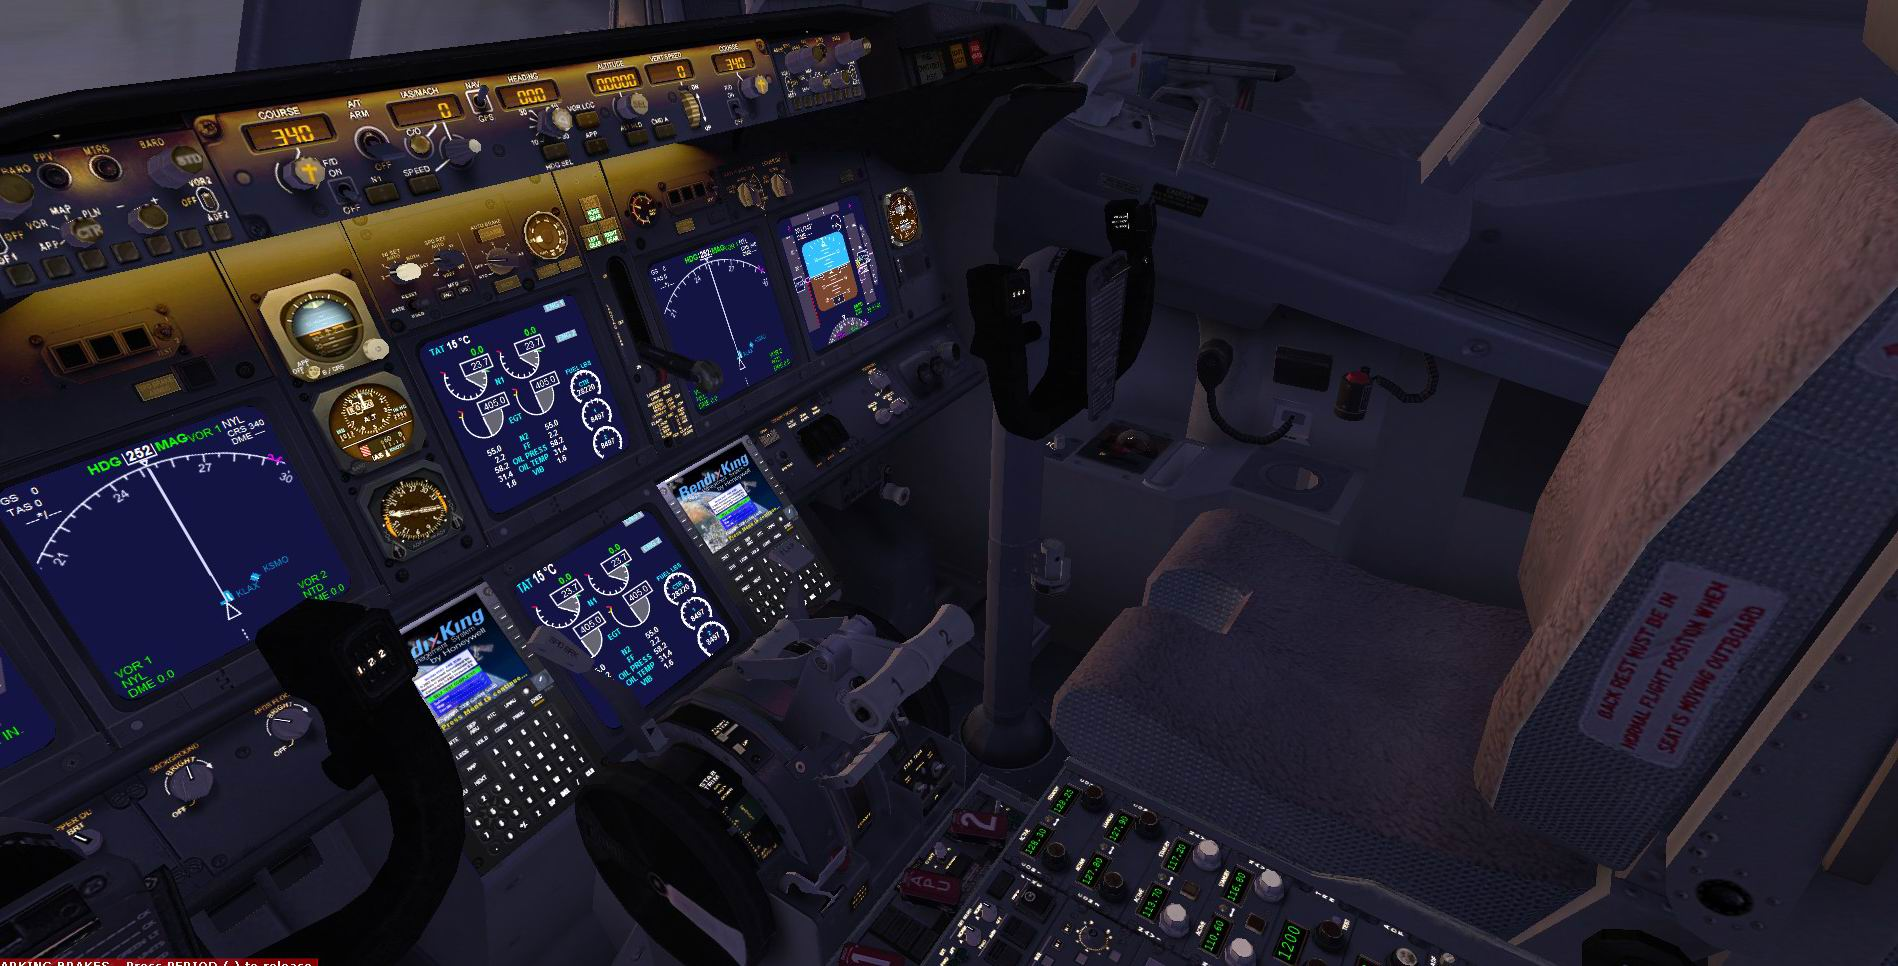 fs-freeware net - FSX Boeing 737-800 Kulula com